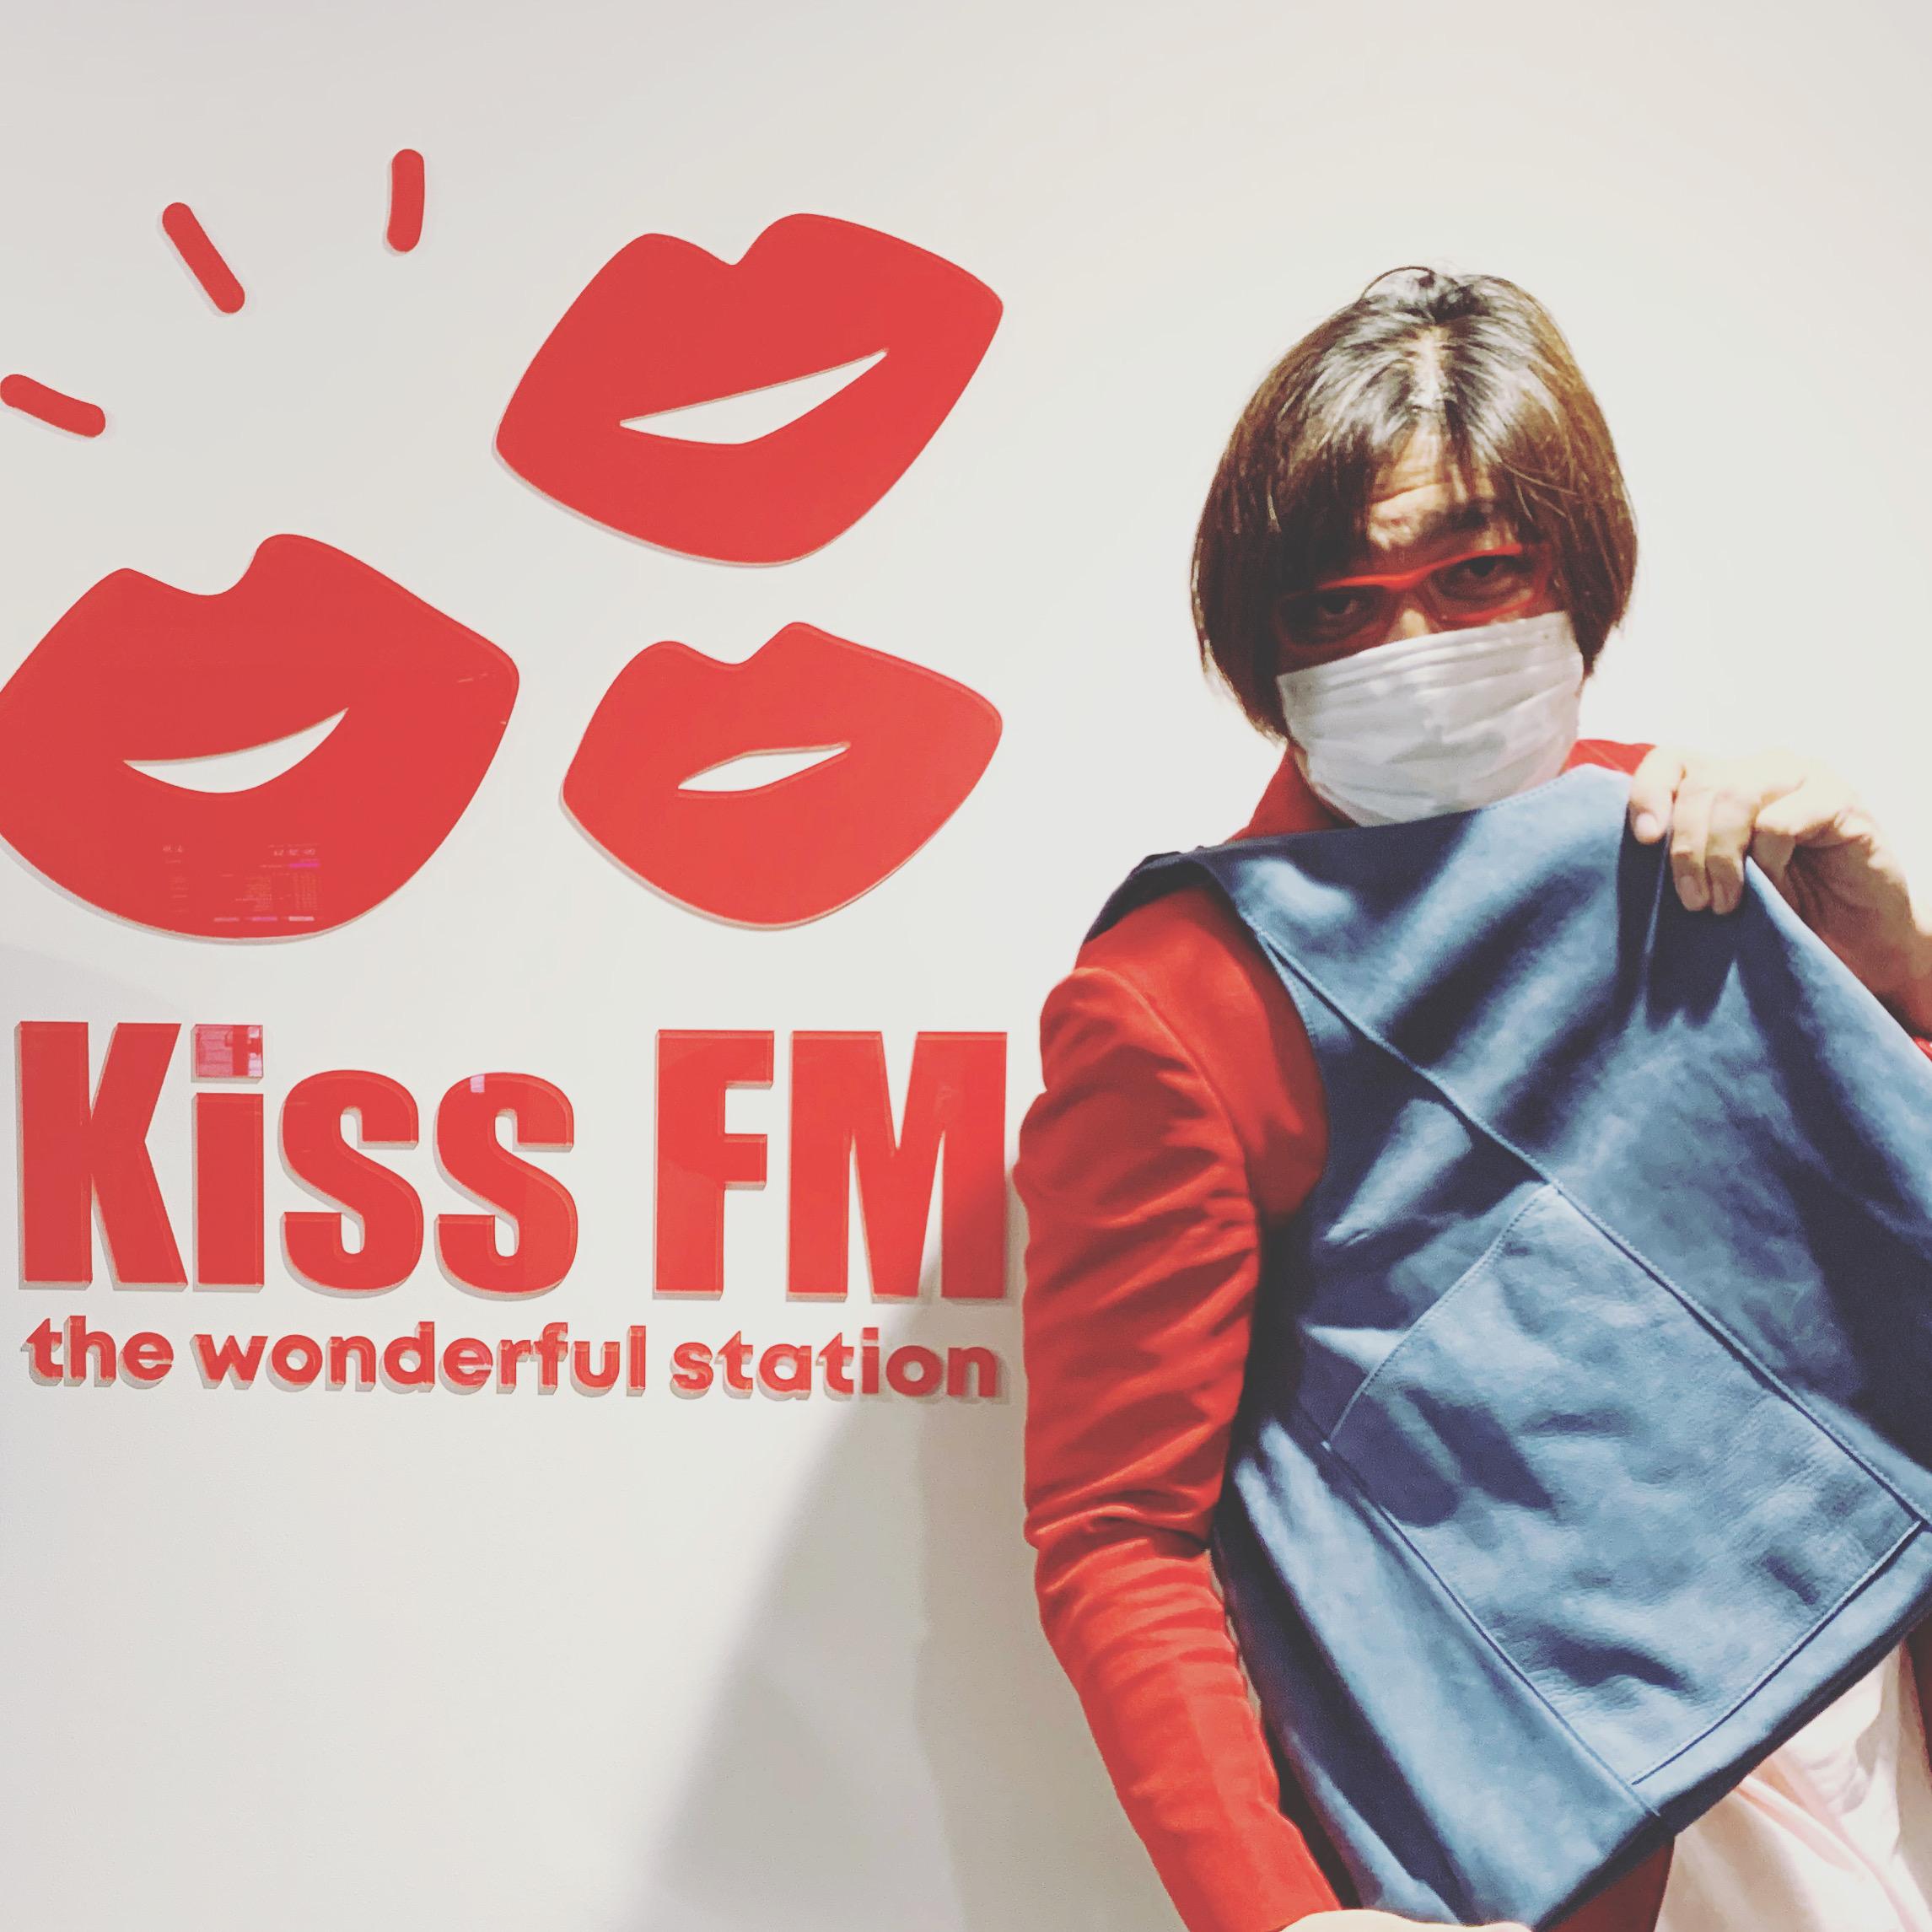 Kiss FMラジオ番組に生出演してきました♪